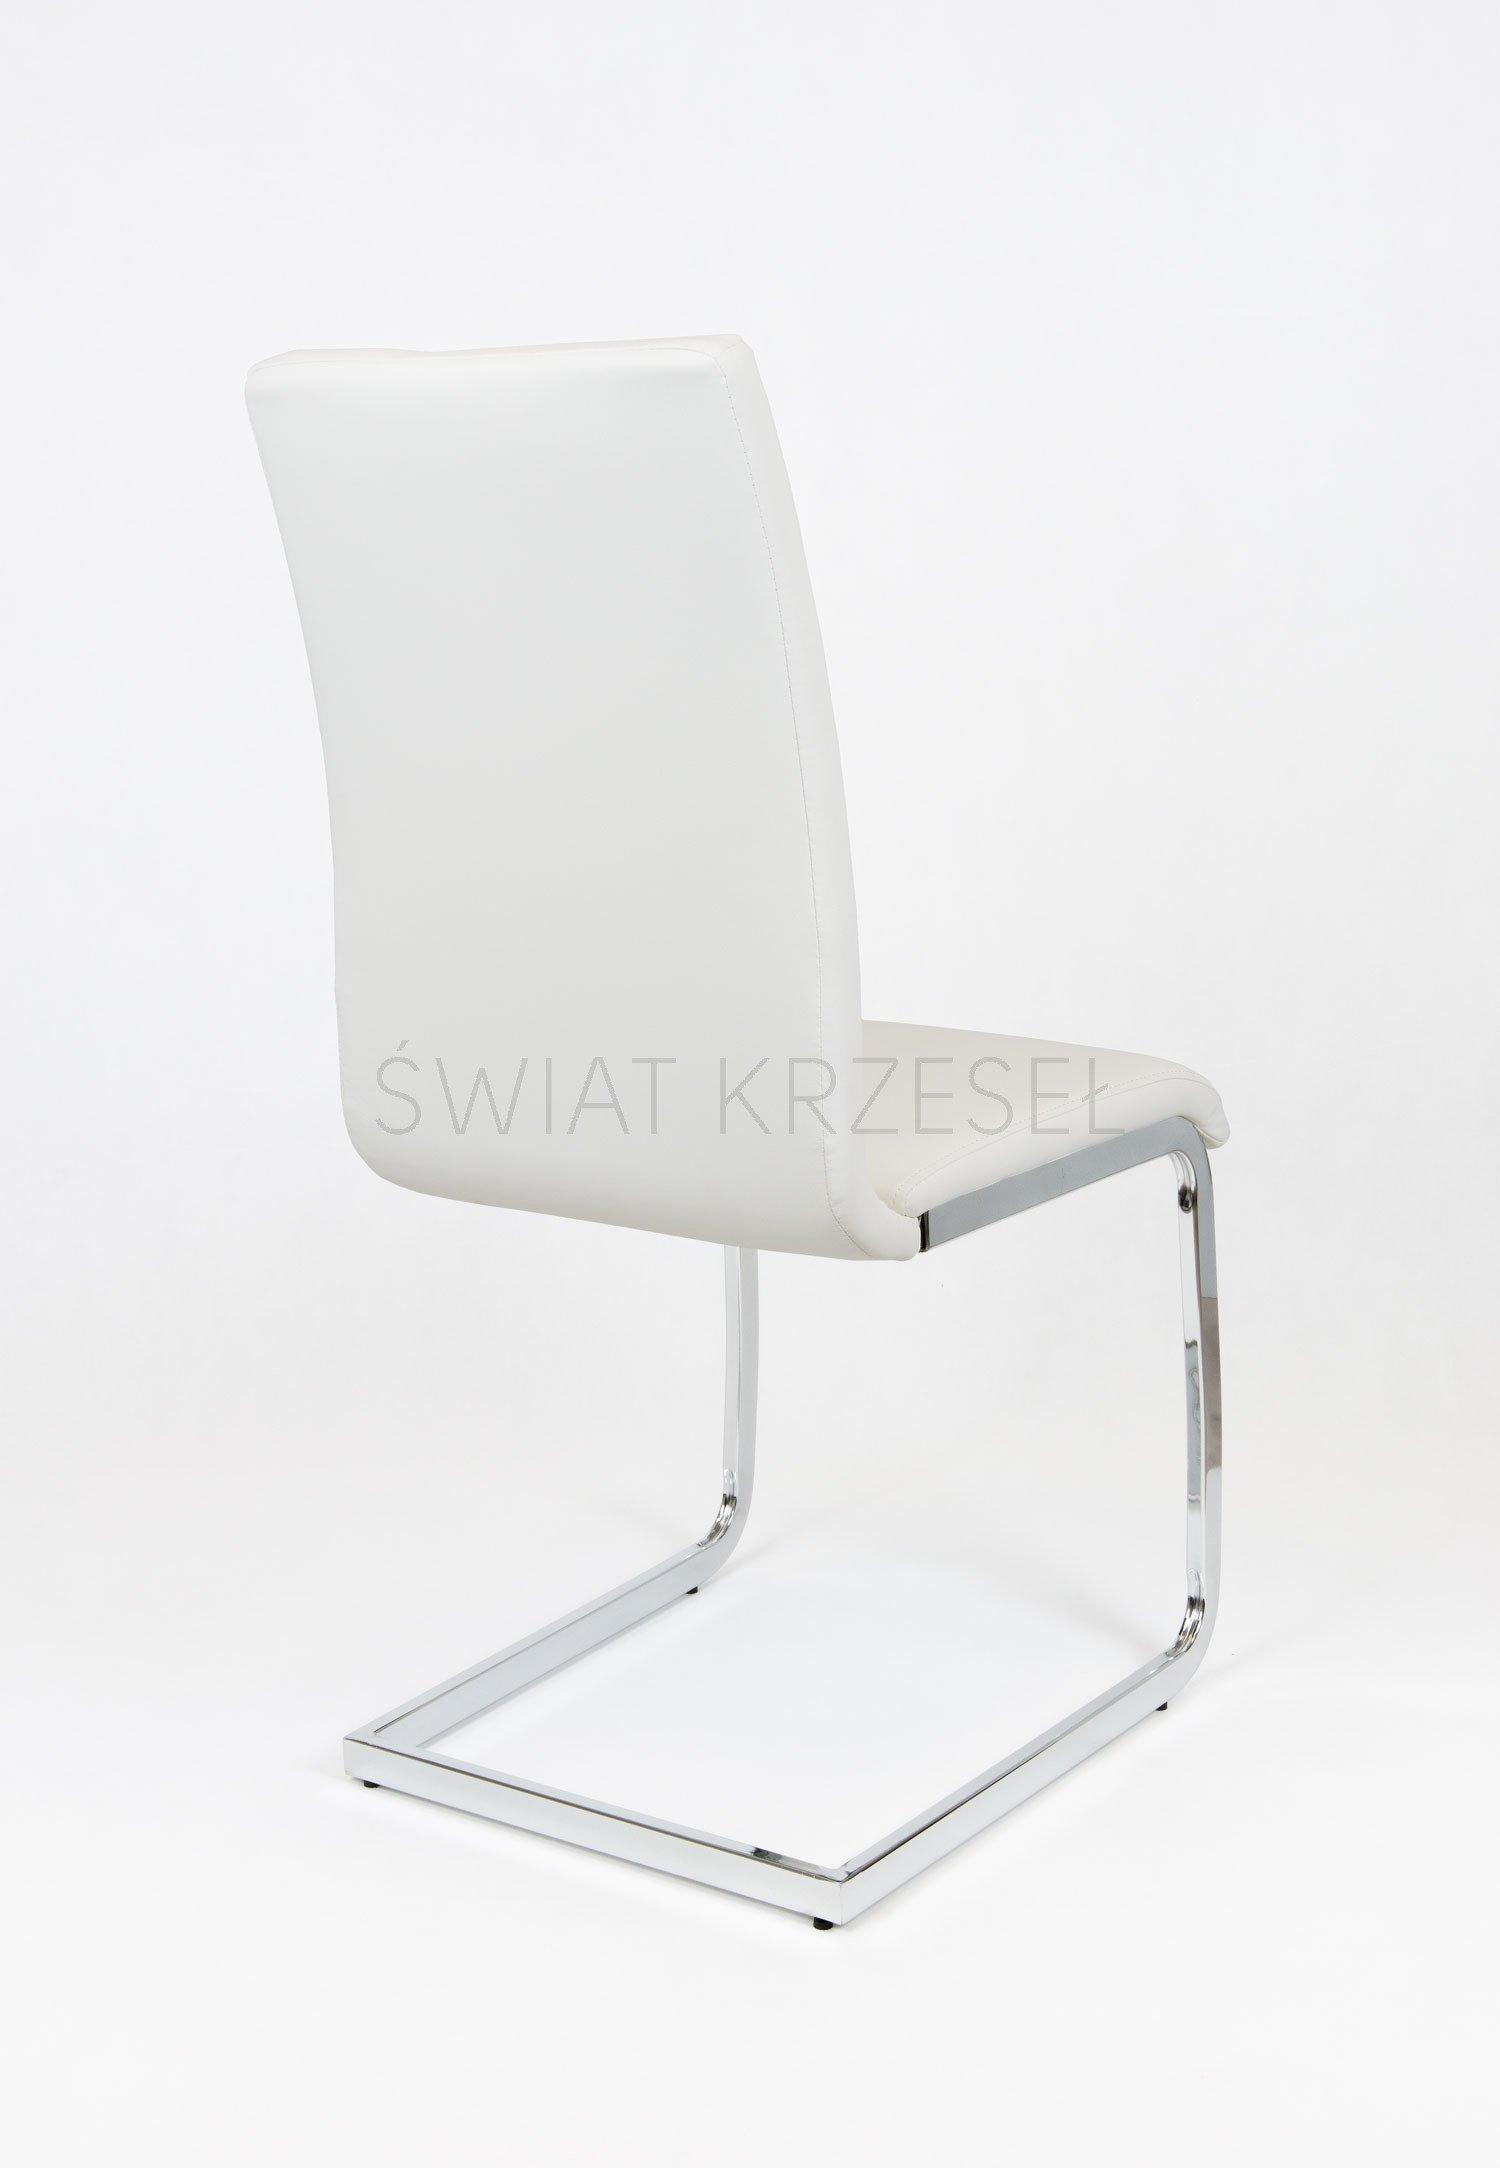 sk design ks038 weiss kunsleder stuhl mit chrome weiss angebot st hlen salon esszimmer. Black Bedroom Furniture Sets. Home Design Ideas